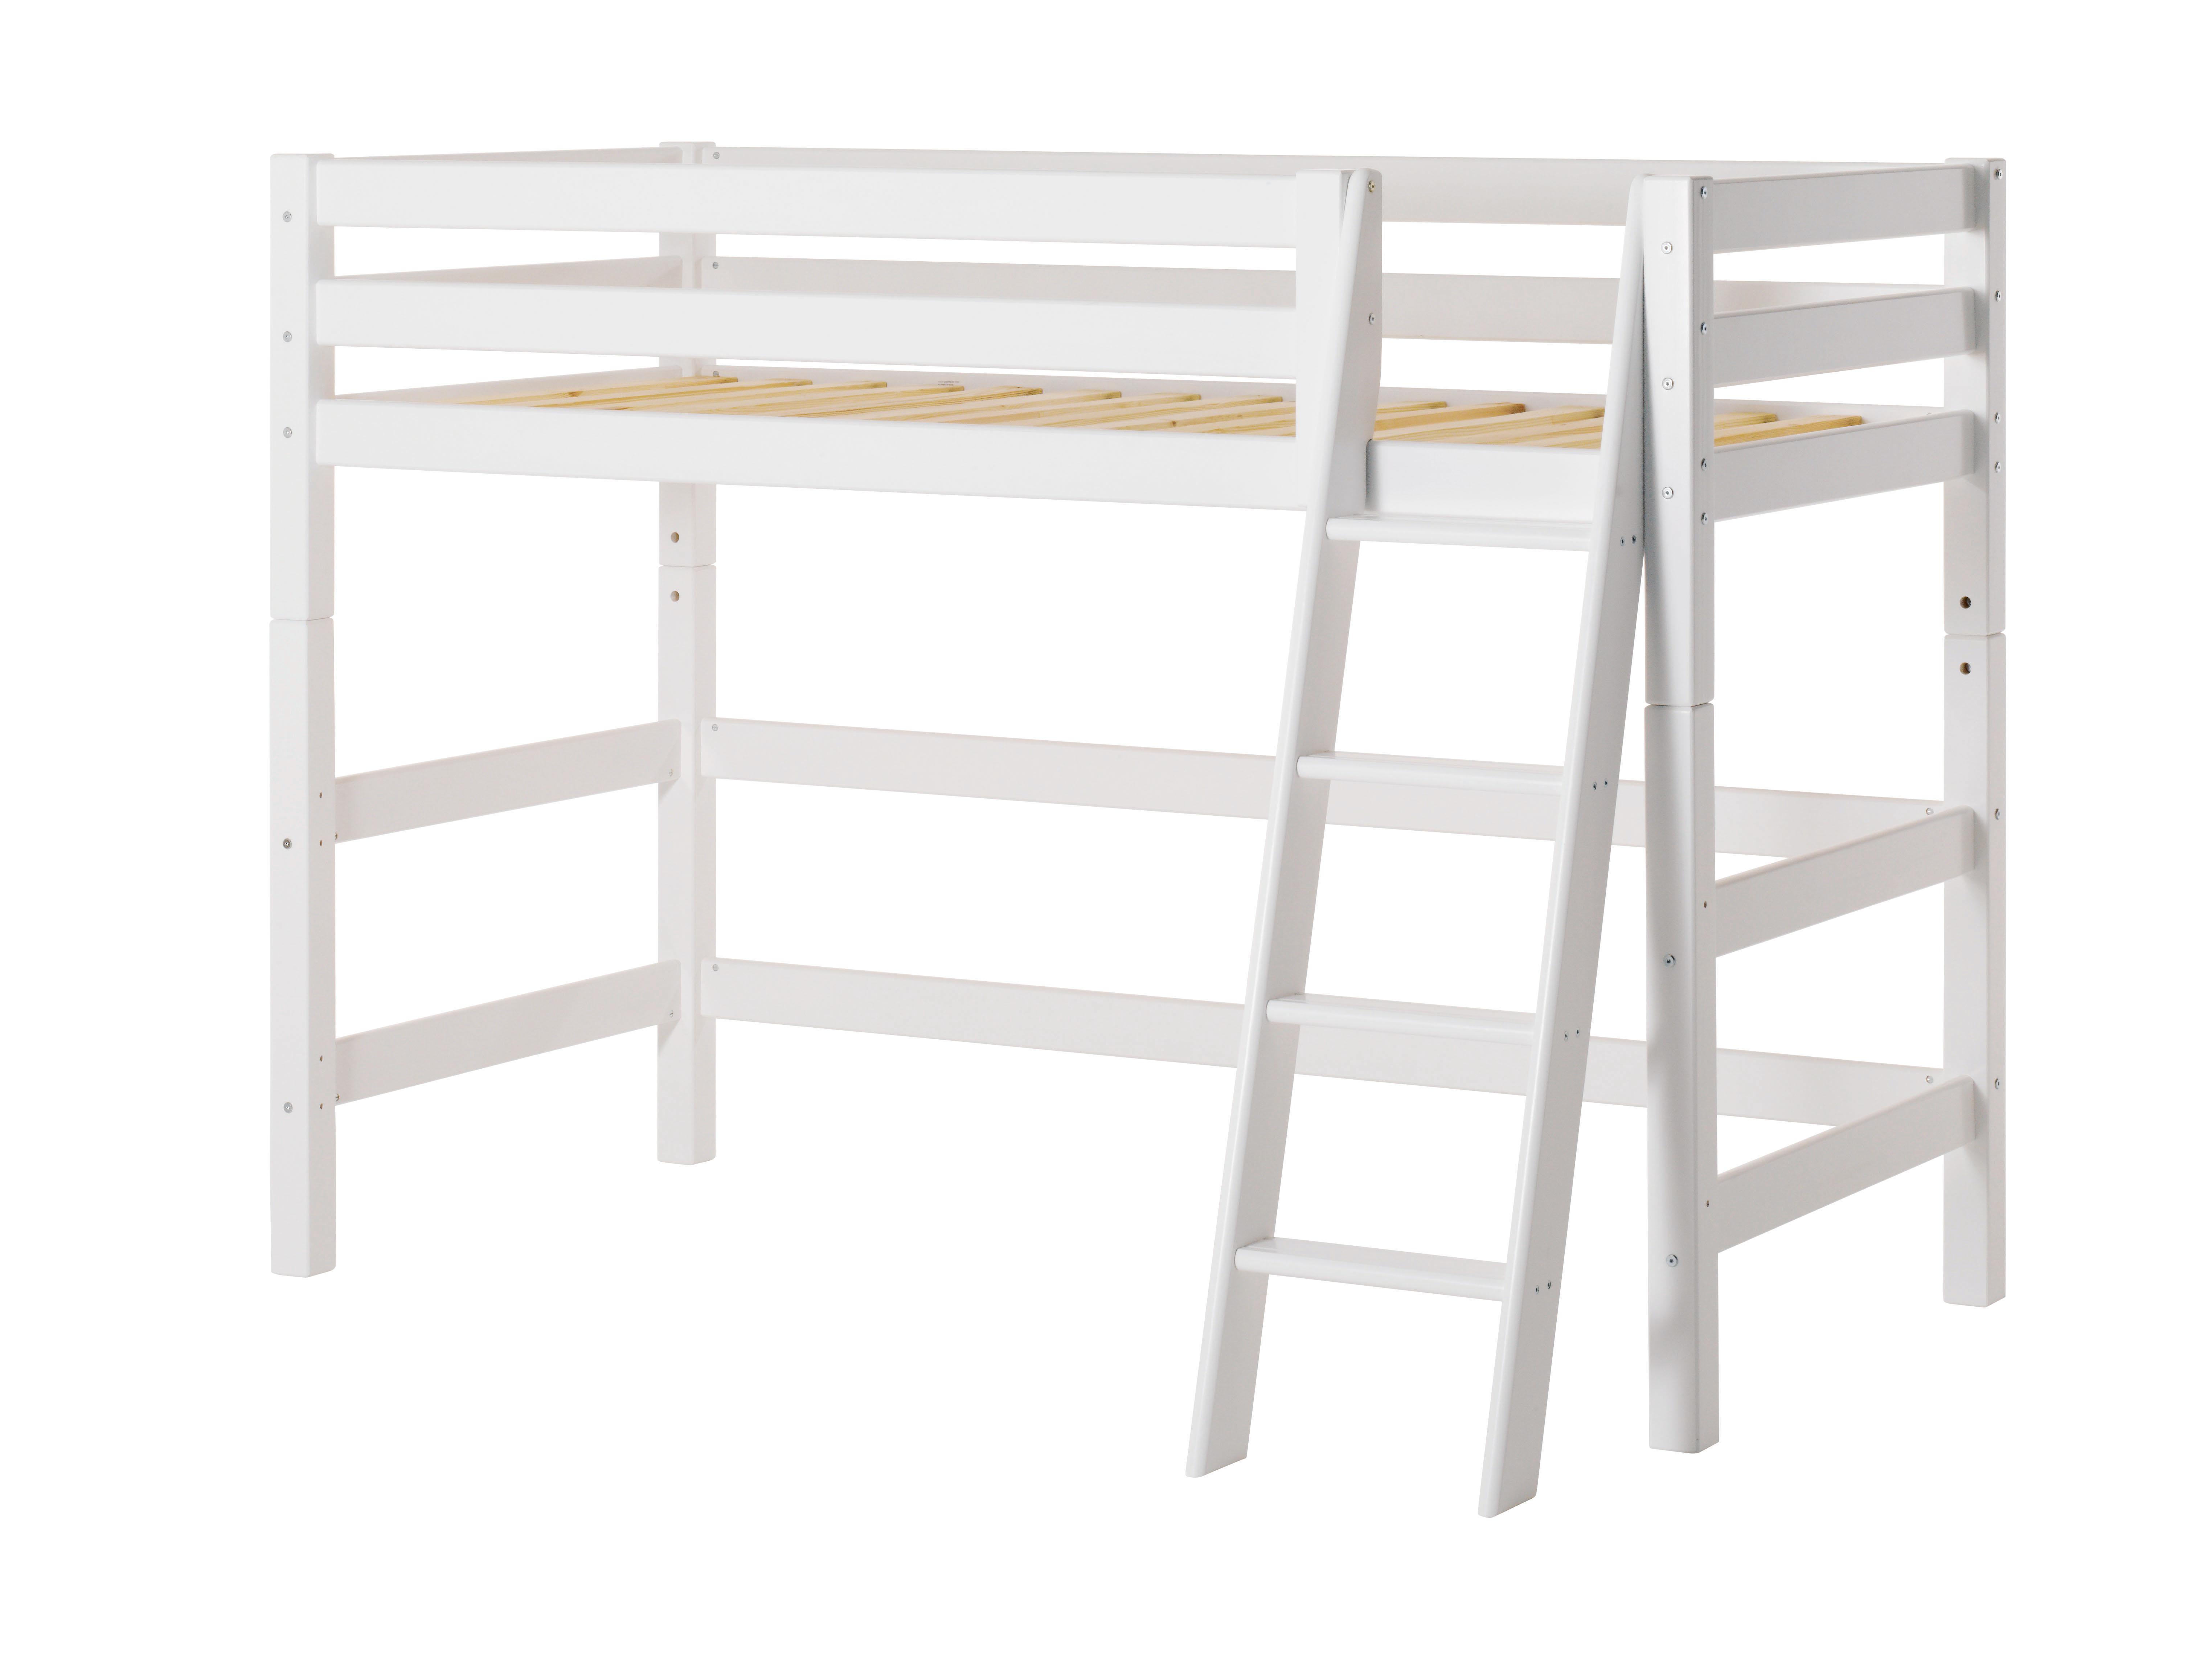 Hoppekids - PREMIUM Mid-high Bed 70x160 with Slant Ladder